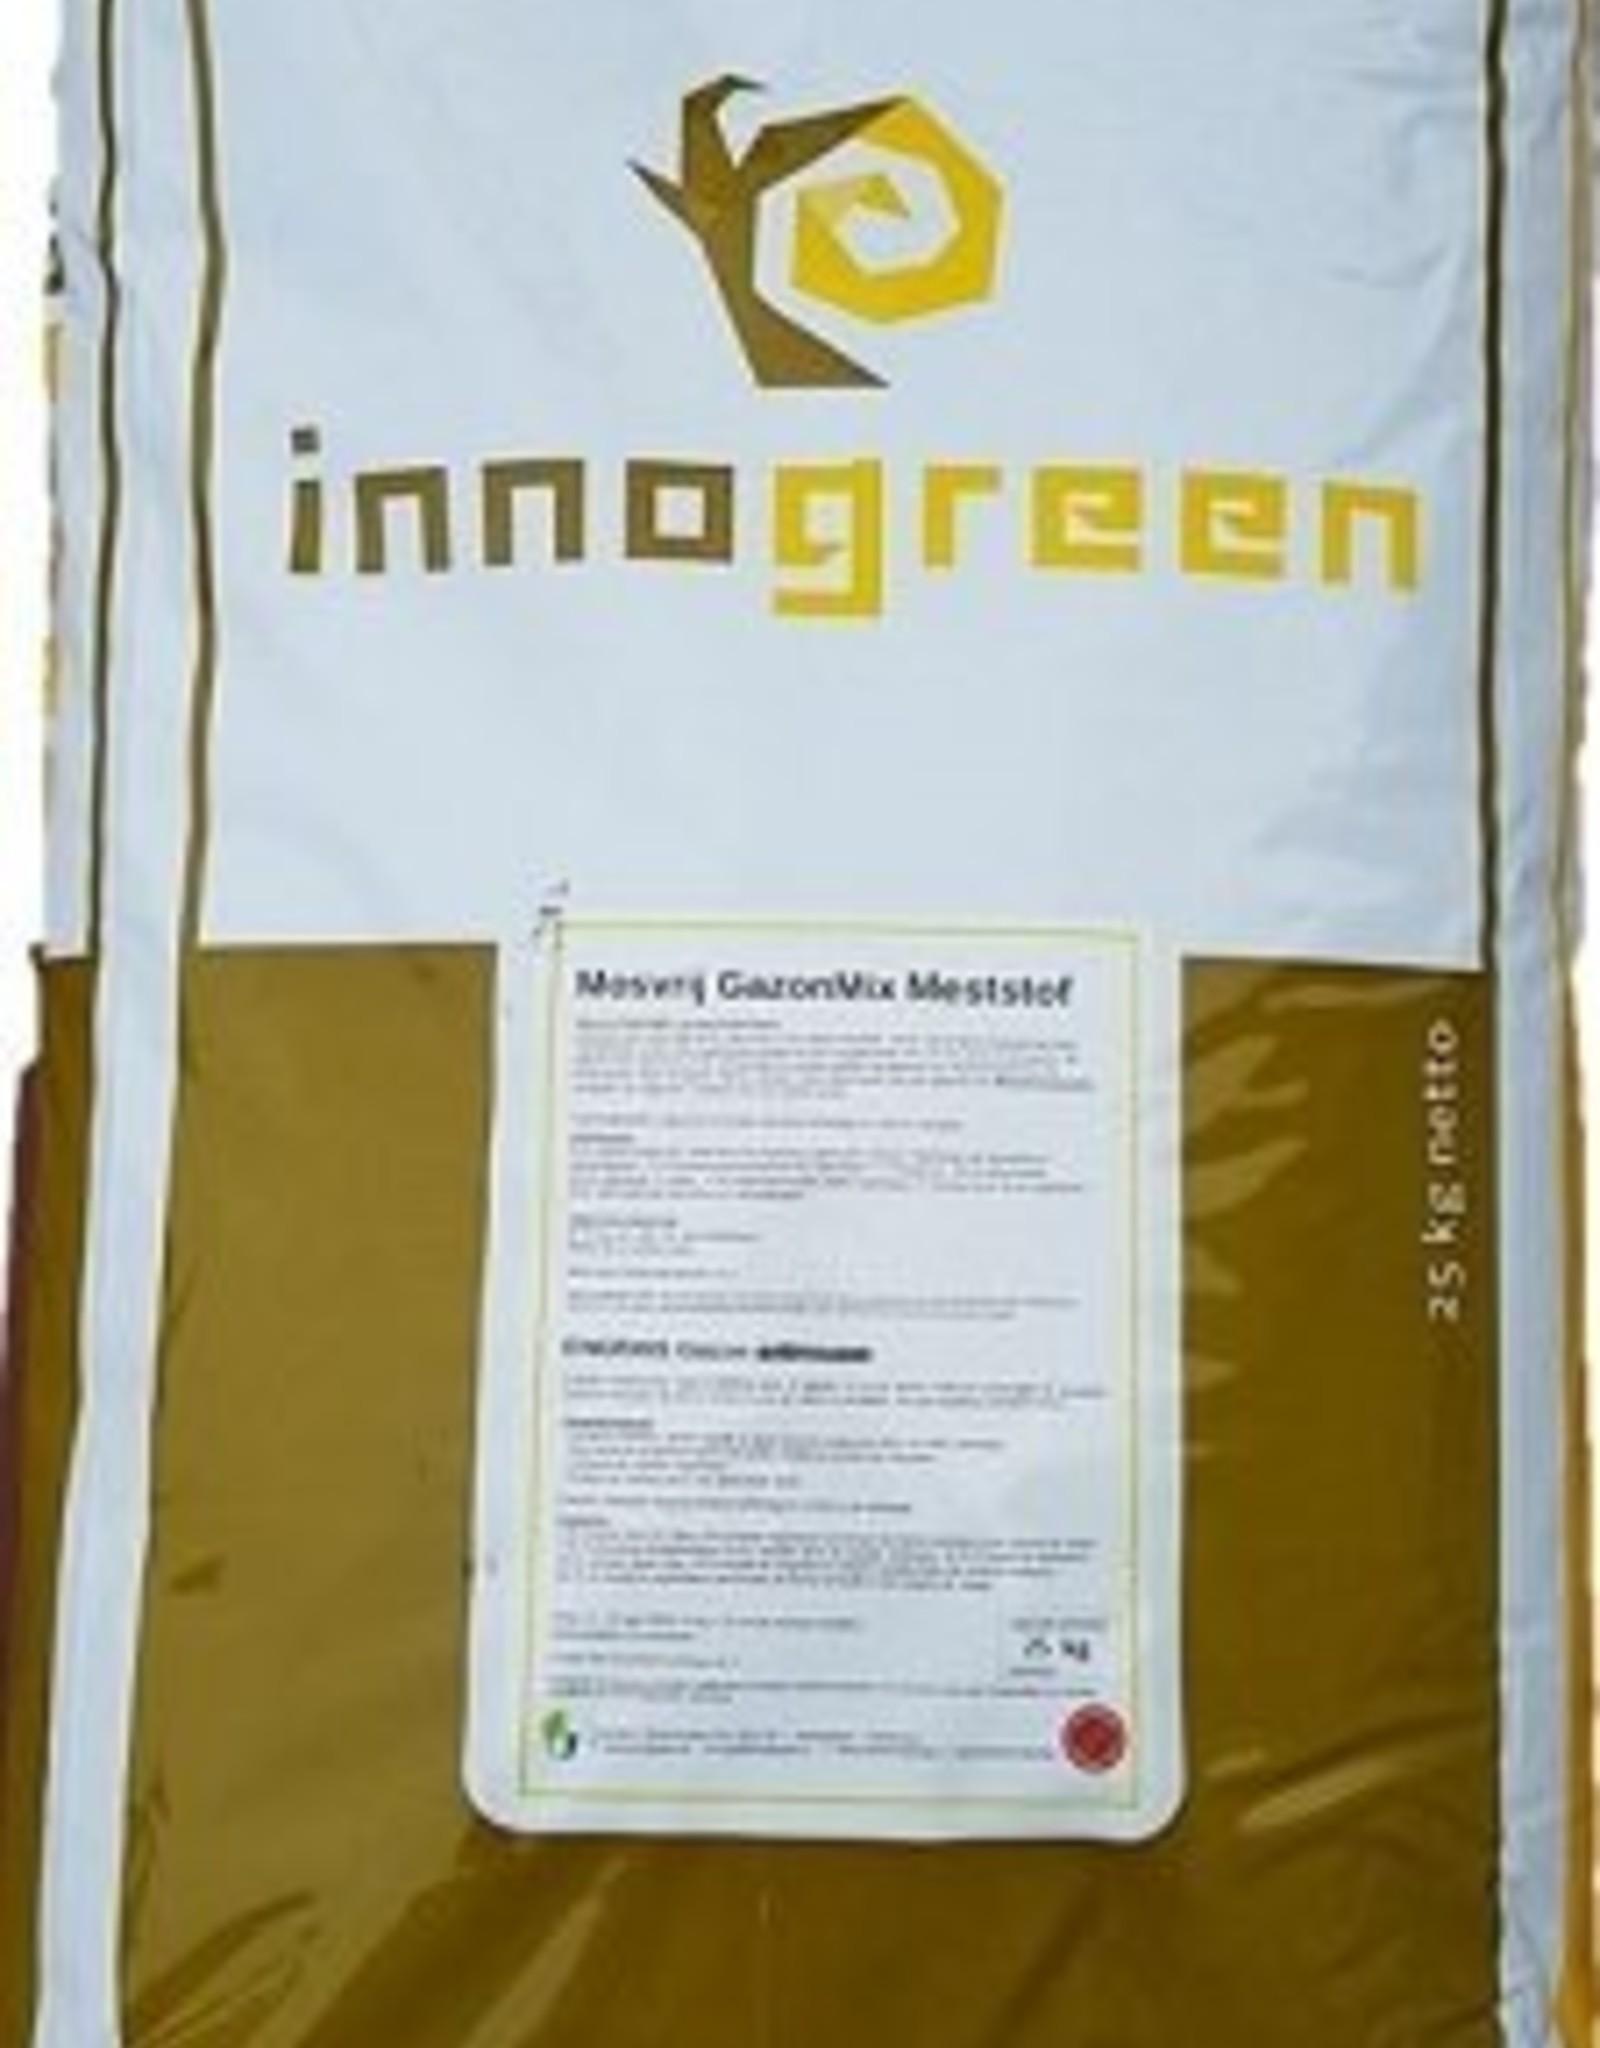 Brimex Innogreen Innogreen Mosvrij gazon meststof 6-2-20 + 3 Mgo